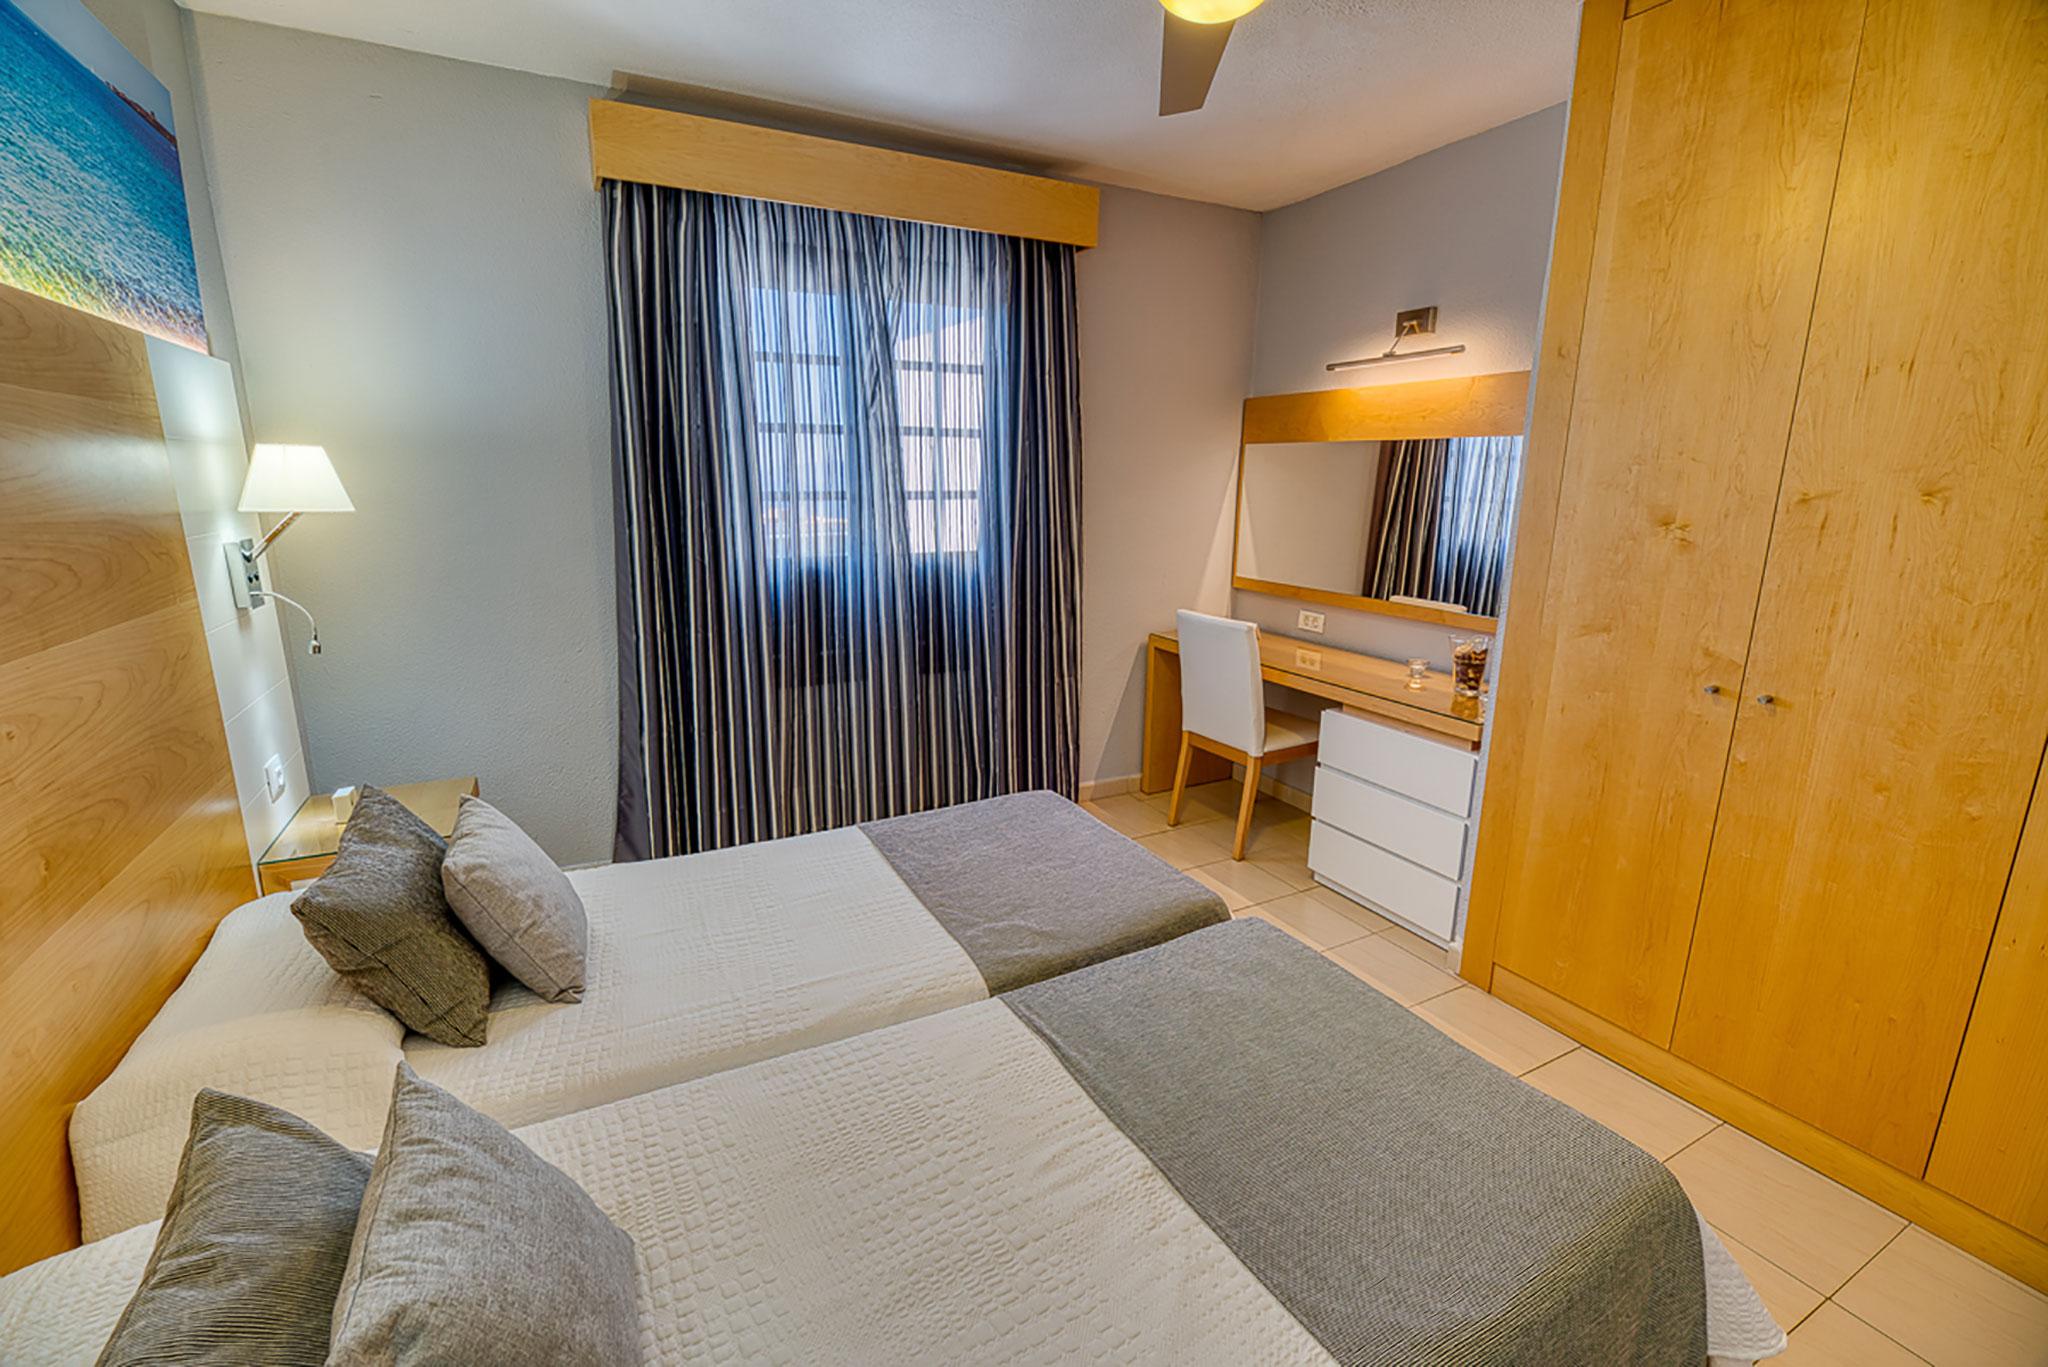 Hotel Rosas Bedroom Desk